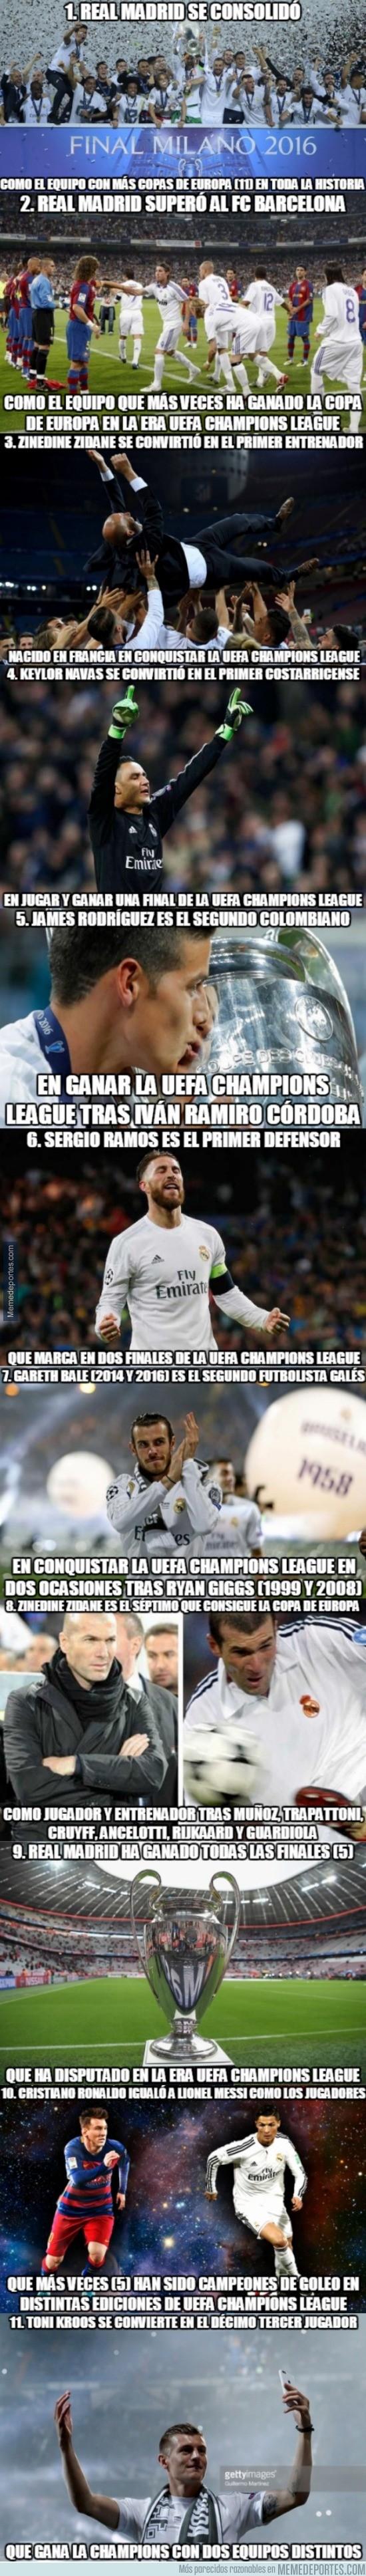 865785 - Historia pura: 11 récords del Real Madrid tras conquistar la Undécima